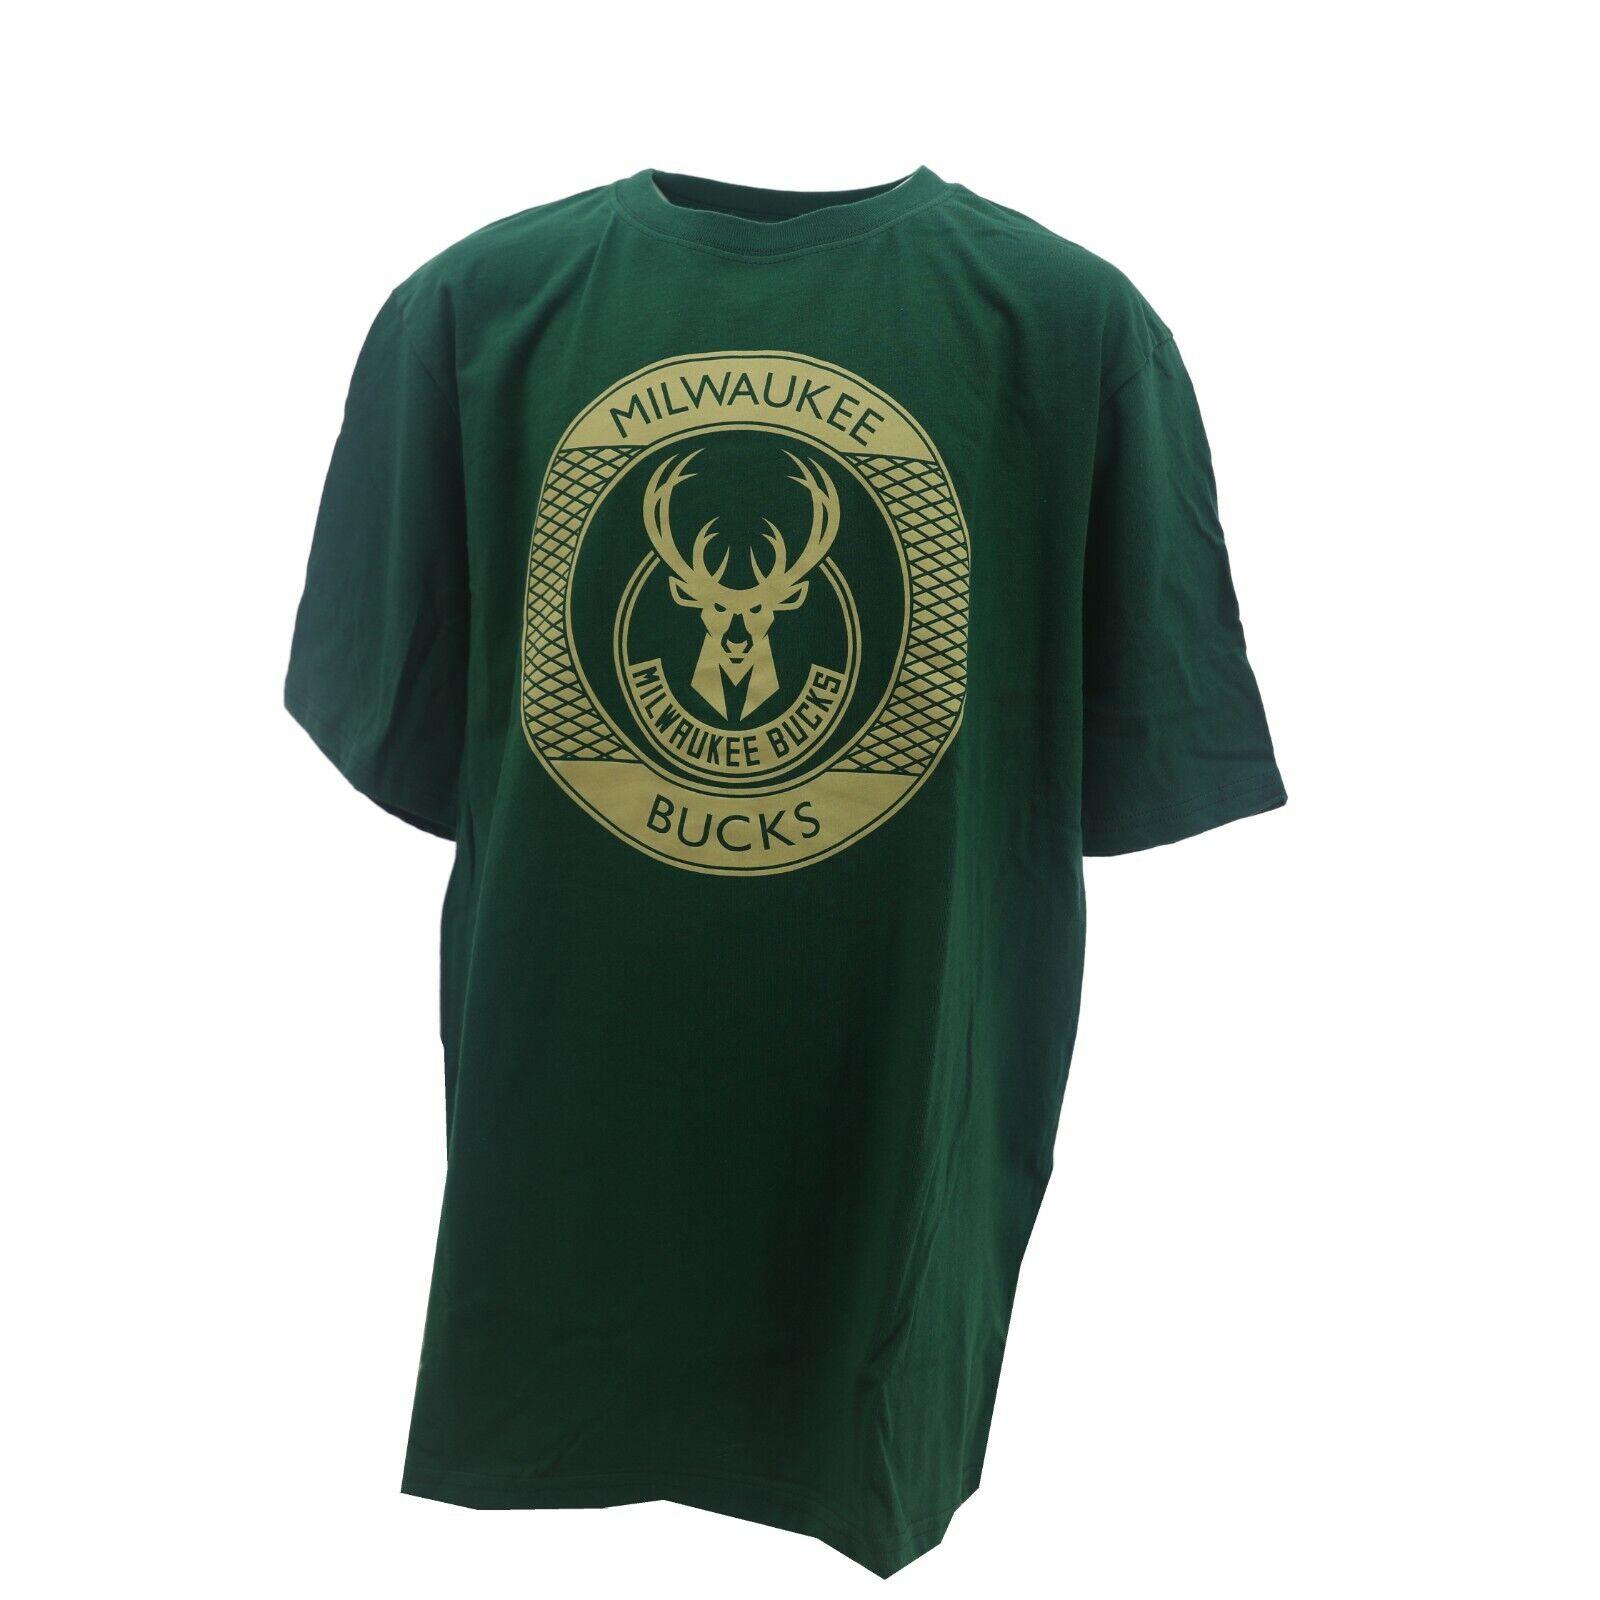 Milwaukee Bucks NBA Official Apparel Kids Youth Size T-Shirt